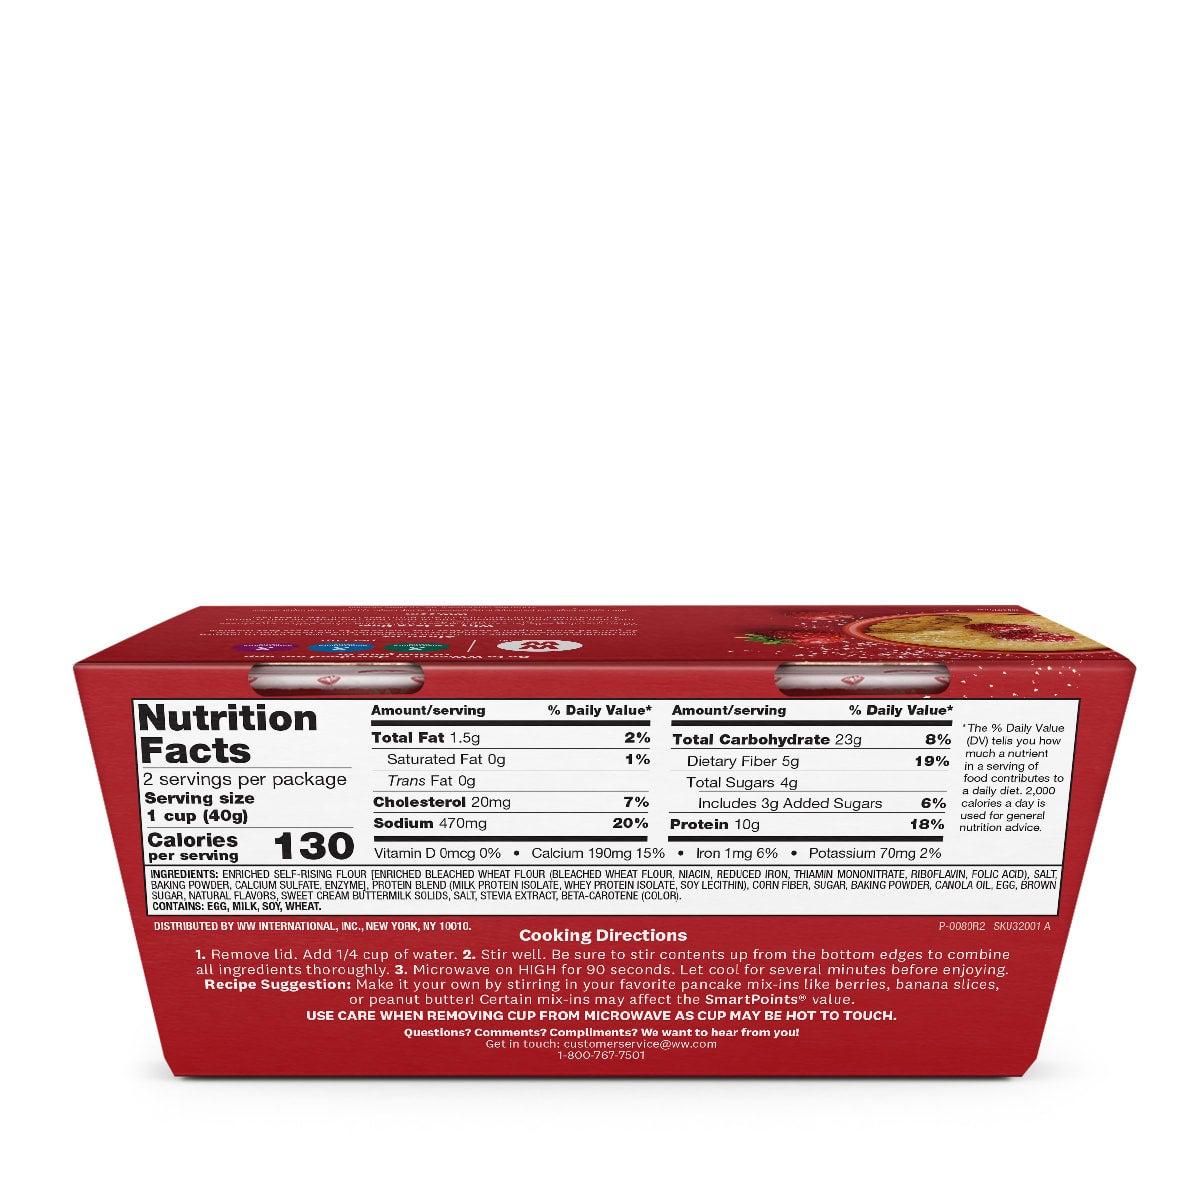 Buttermilk Protein Pancake Mix - back of box